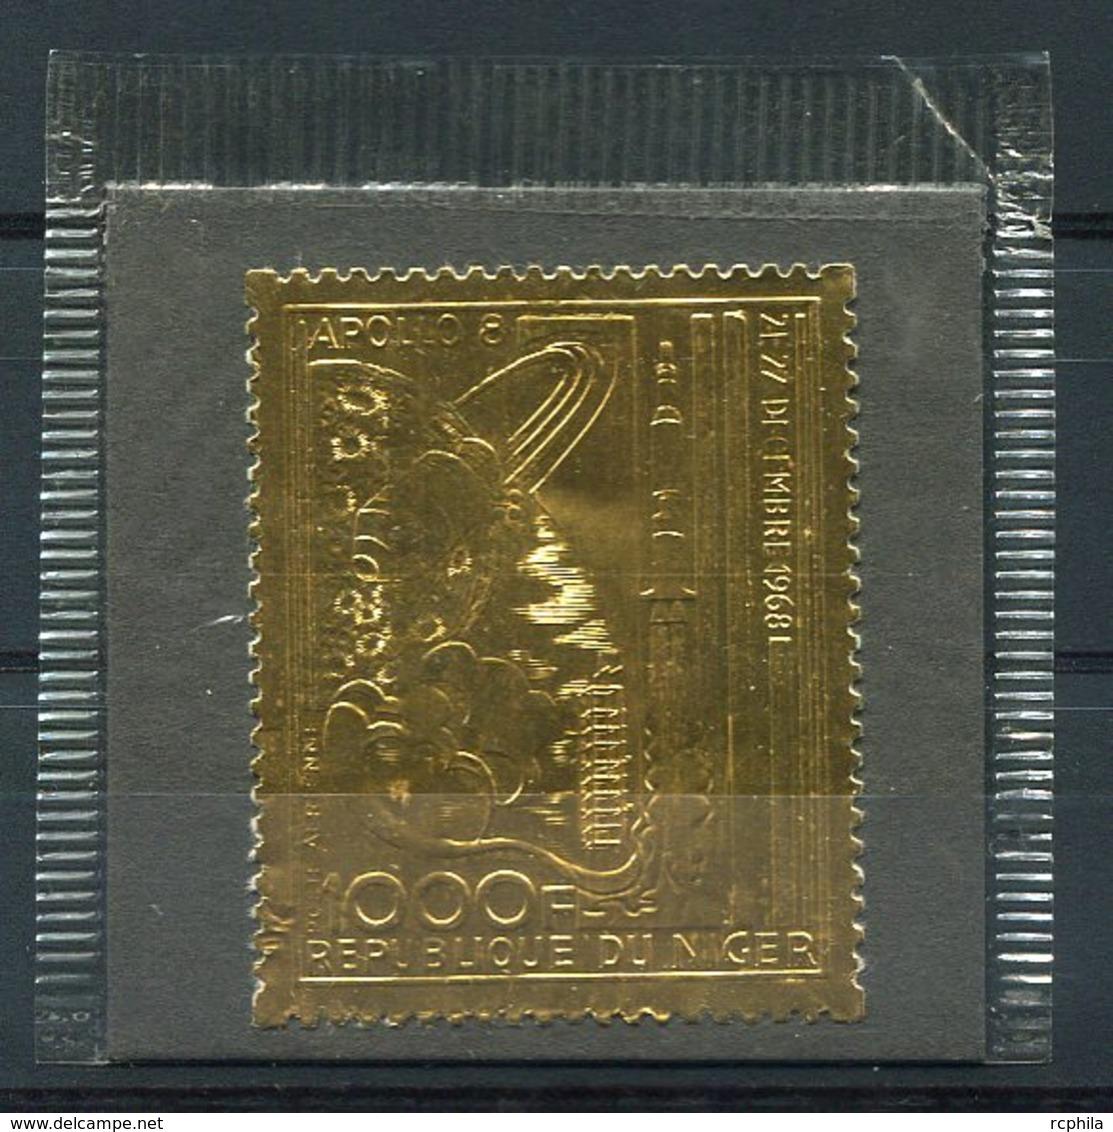 RC 14901 NIGER TIMBRE EN OR - GOLD STAMP APOLLO 8 ESPACE SPACE DANS SA POCHETTE D'ORIGINE NEUF ** MNH TB - Niger (1960-...)